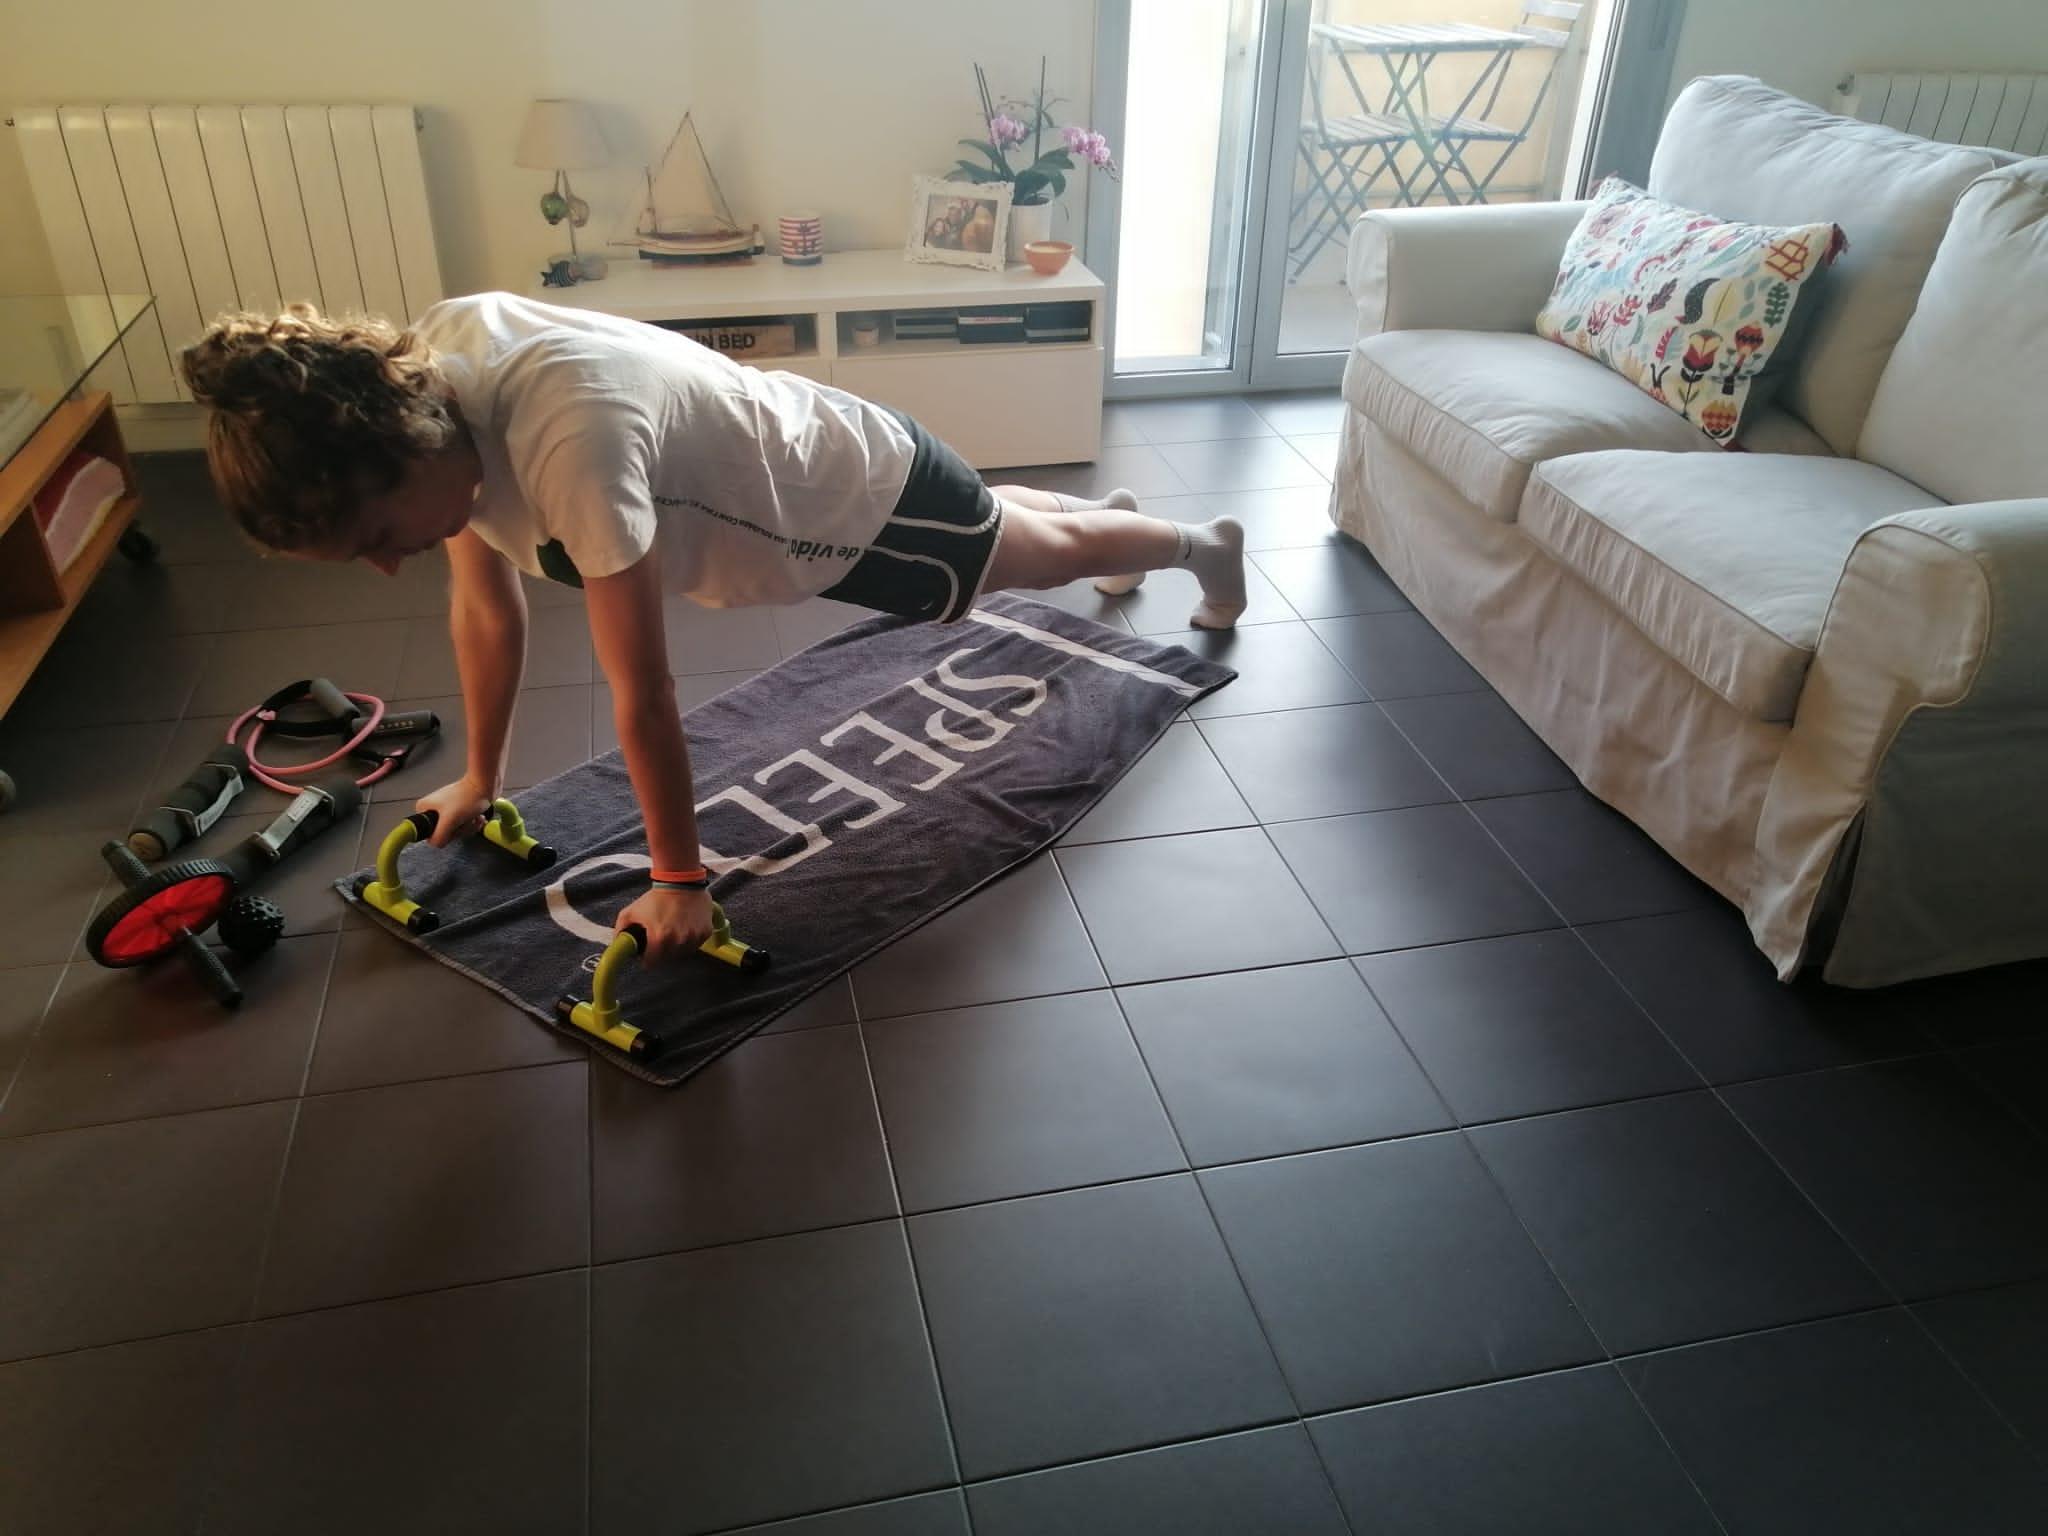 Laura Benedicto, de la UESC, mantenint se en forma des de casa. FOTO: Cedida